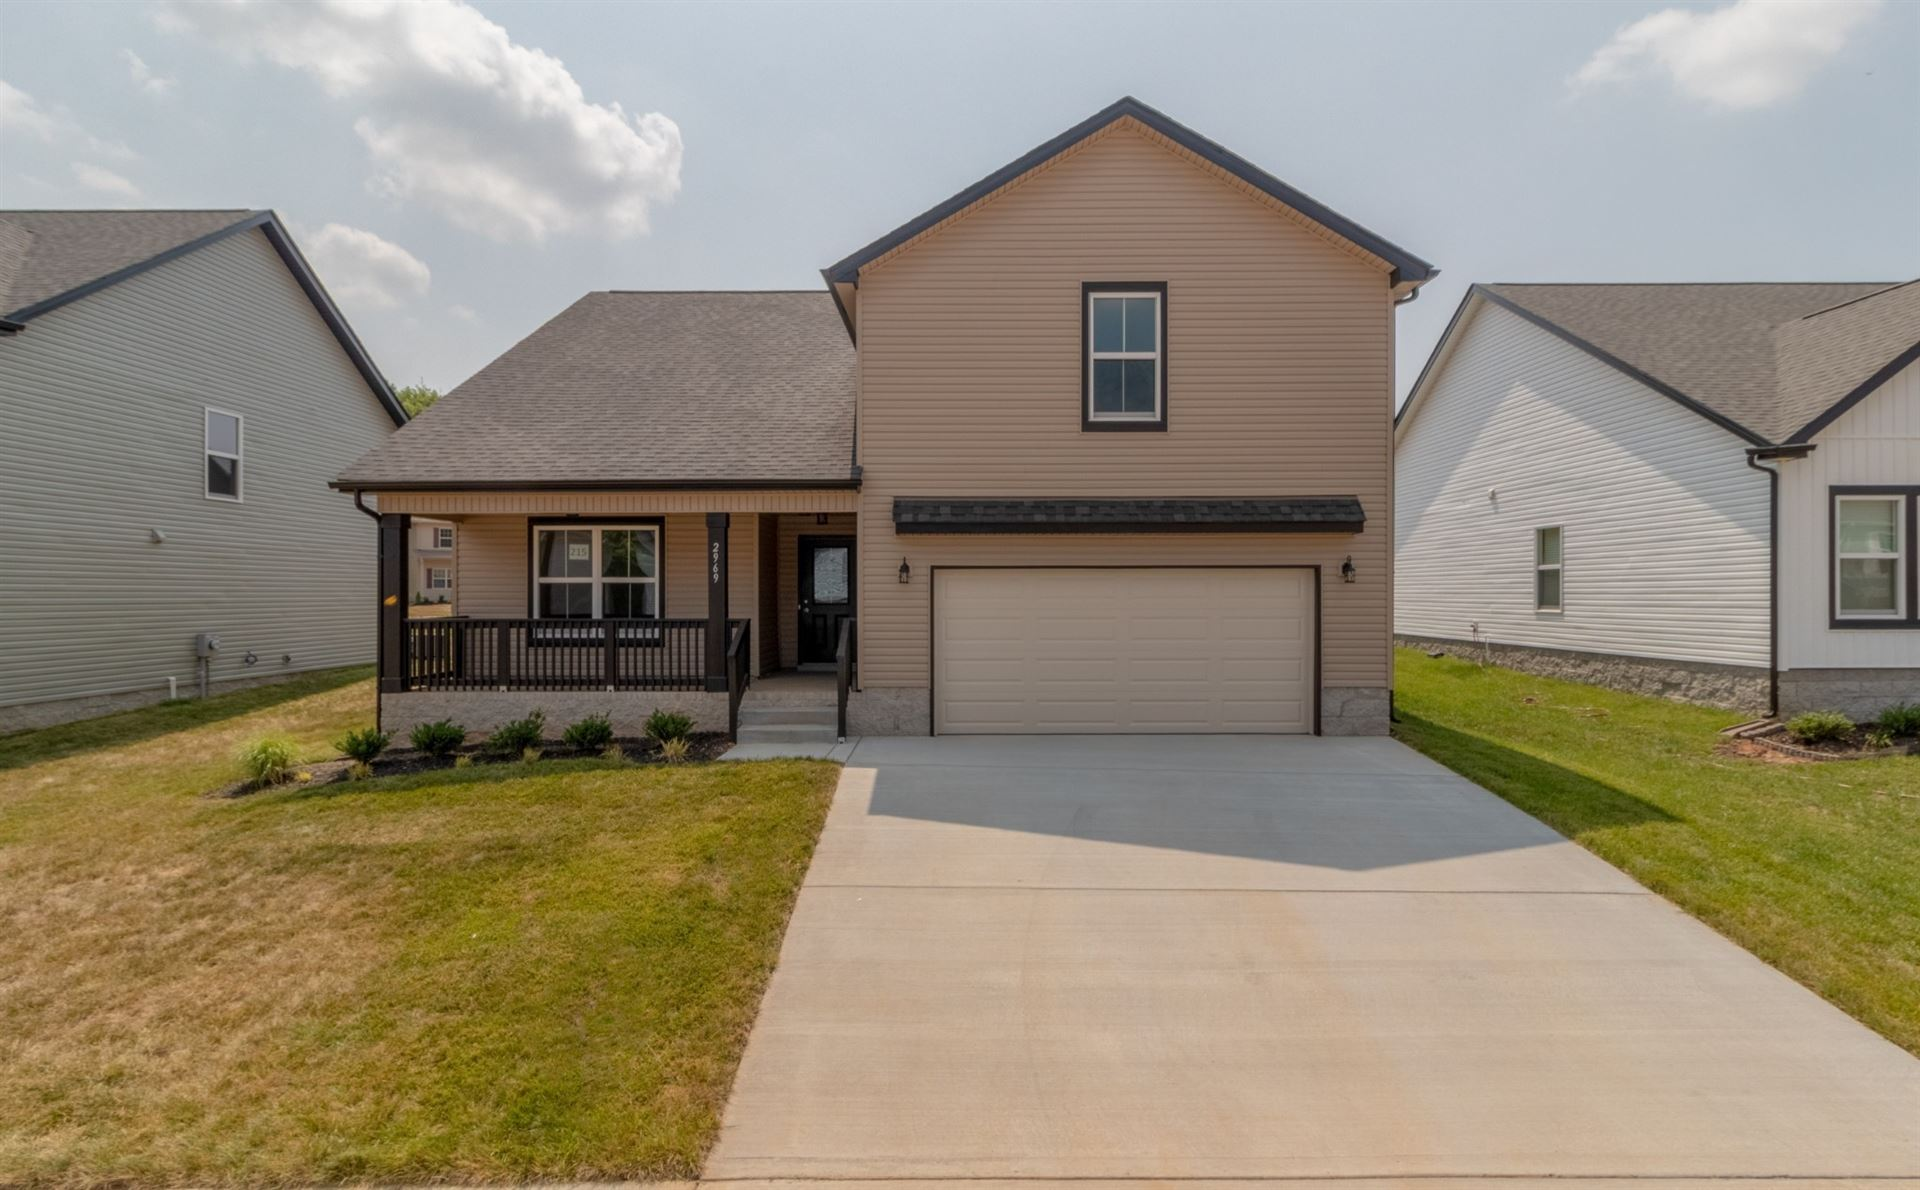 222 Mills Creek, Clarksville, TN 37042 - MLS#: 2299018